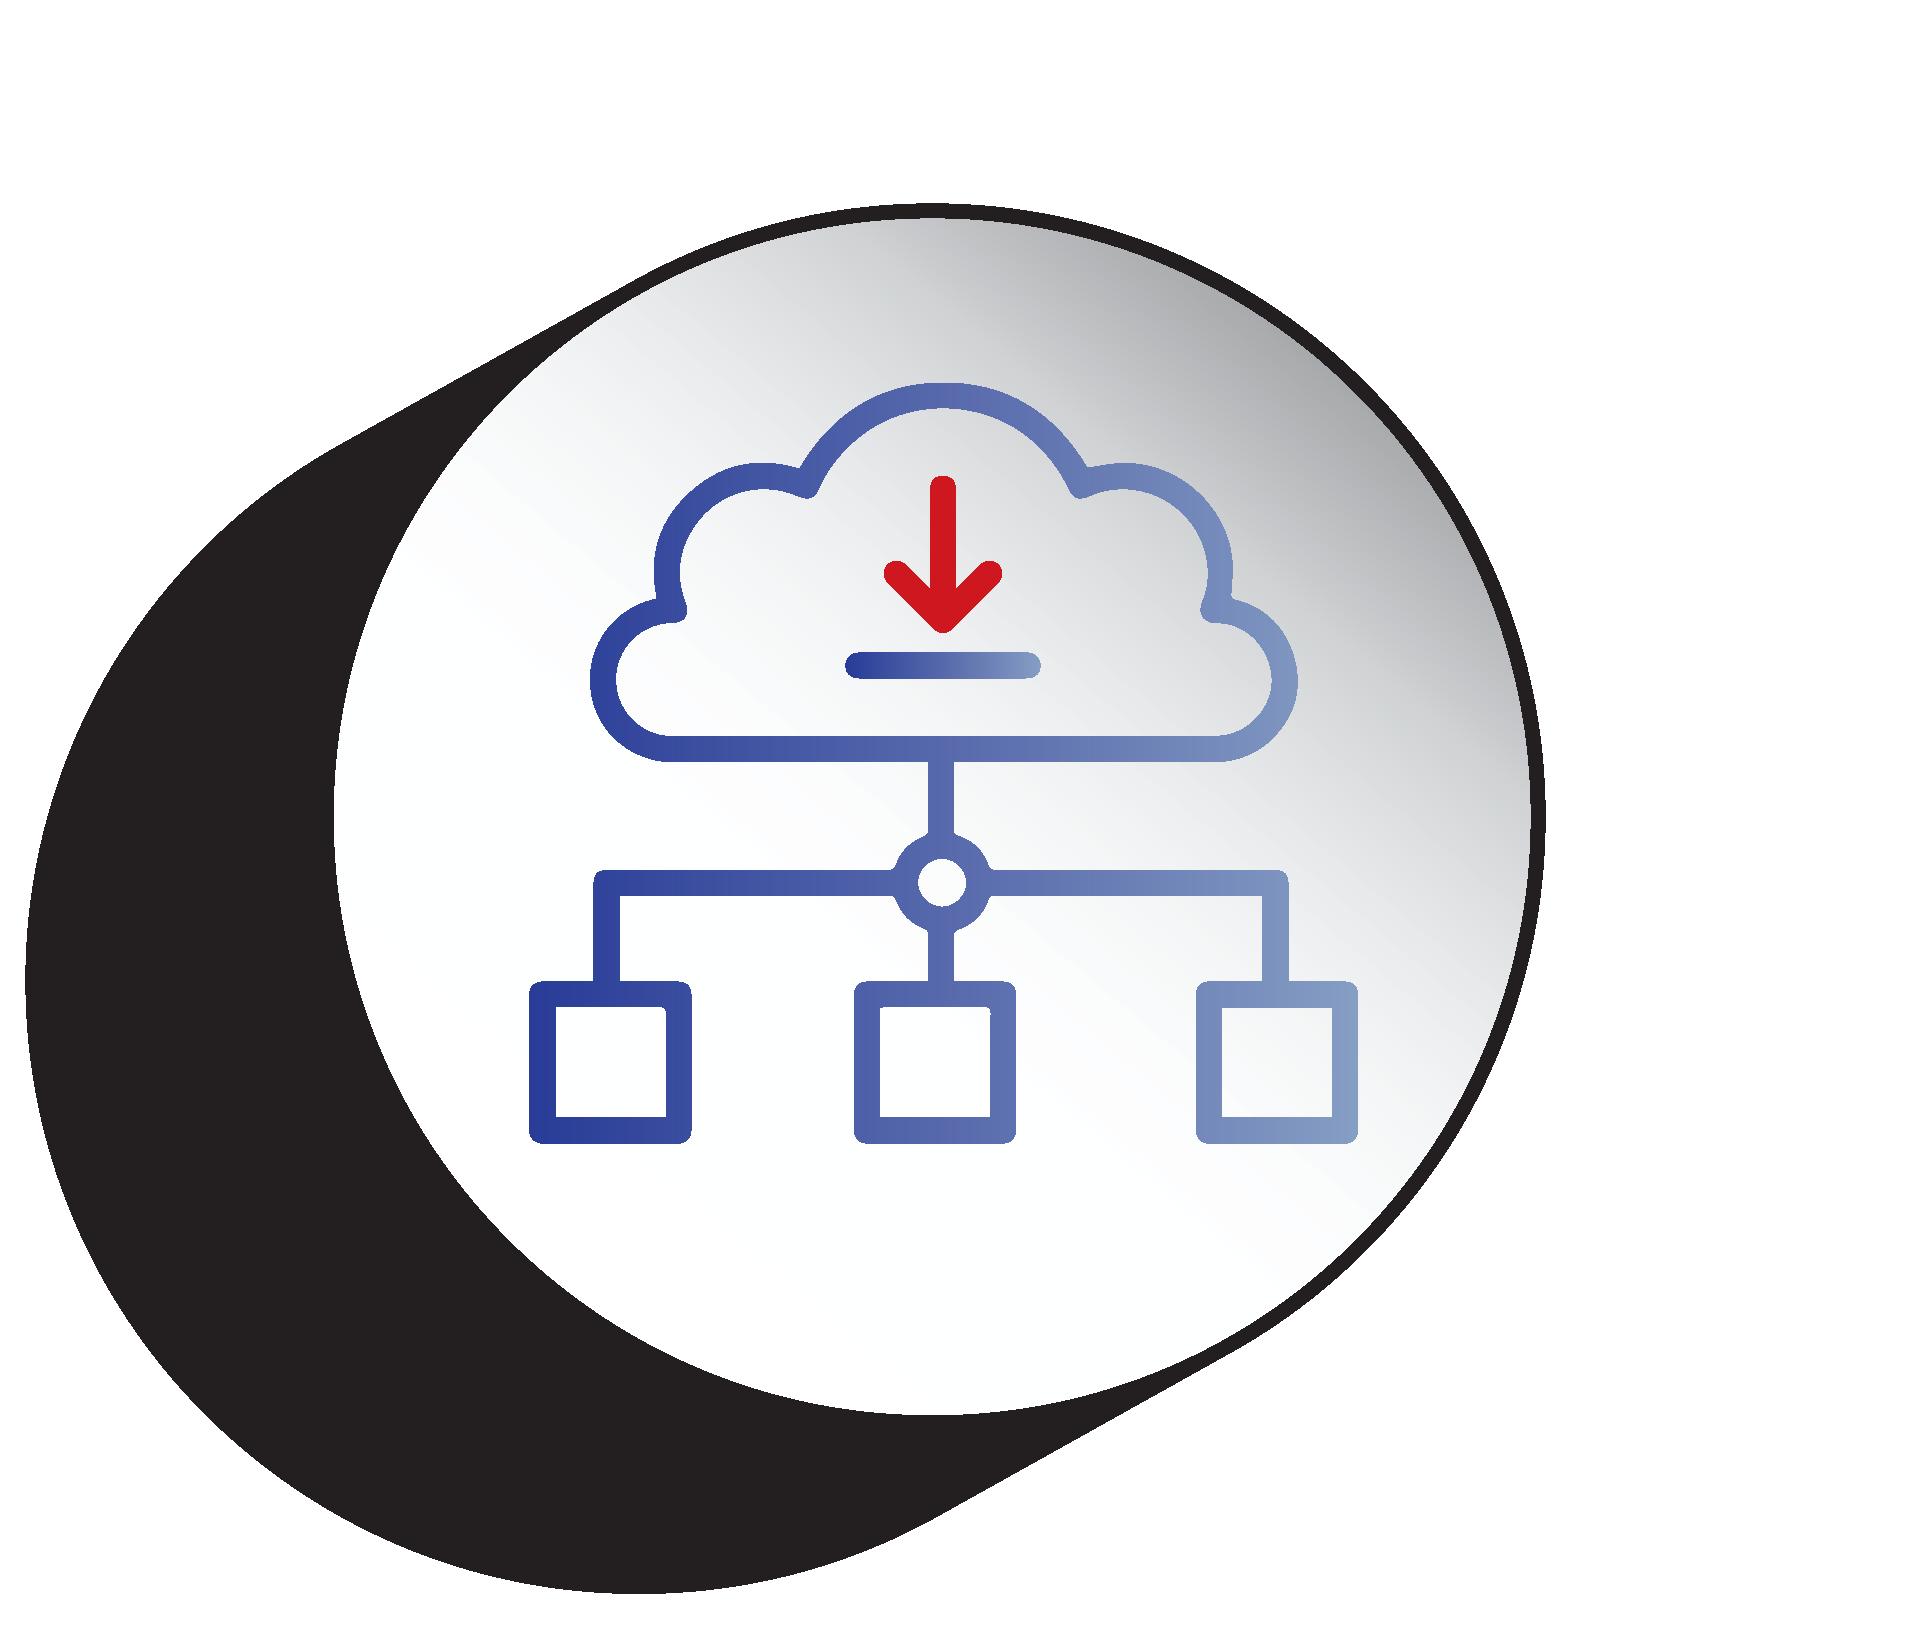 Compatible with SAP Cloud and HANA DB_28 Jan